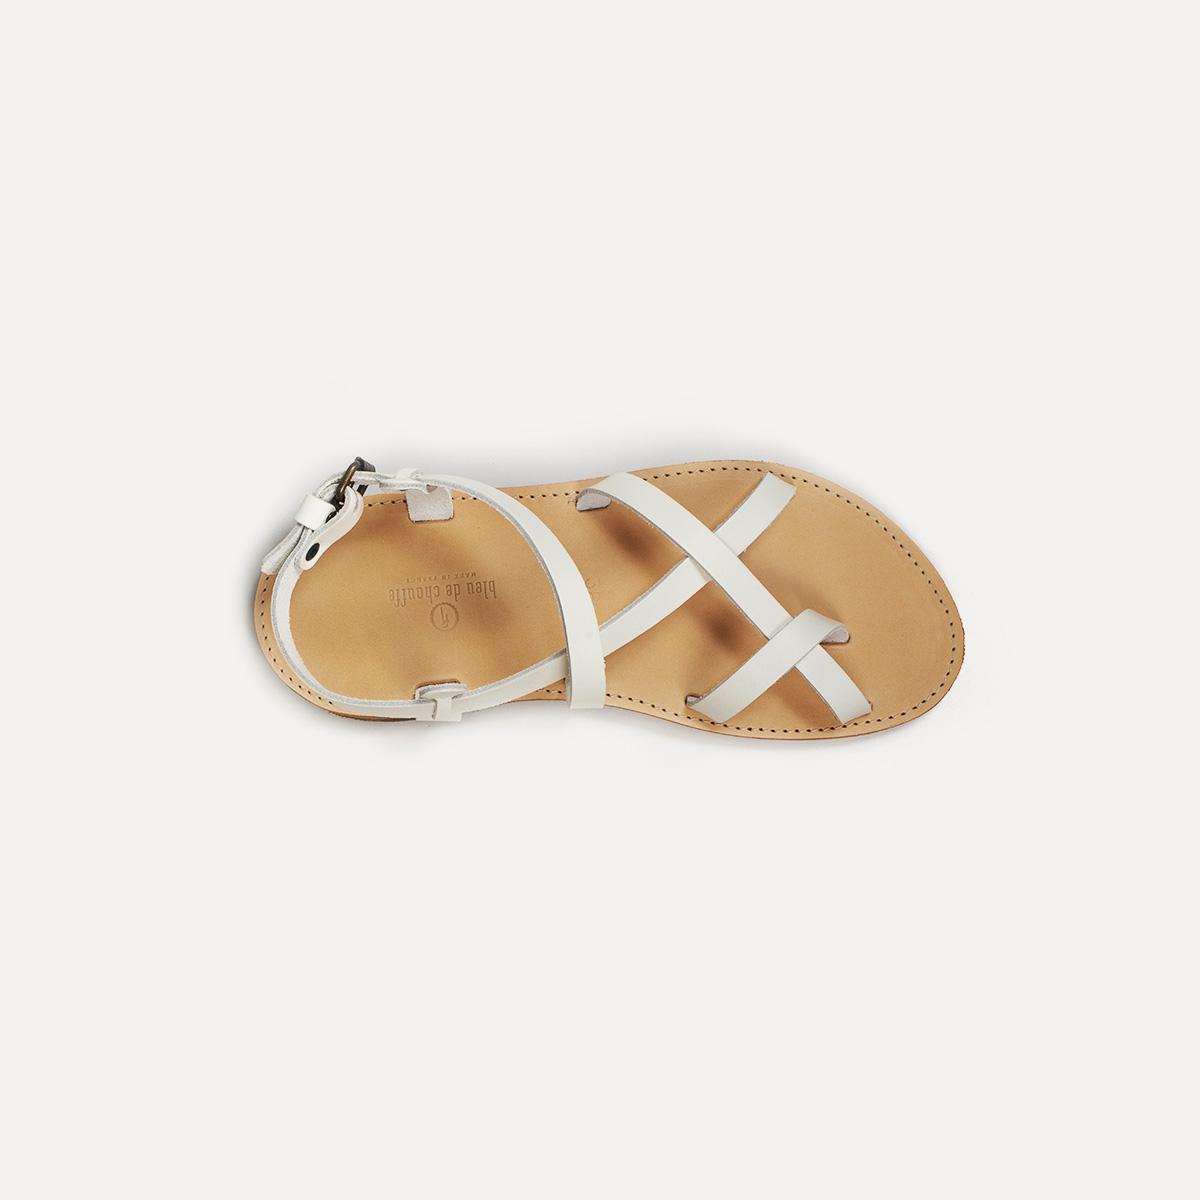 Nara leather sandals - White (image n°4)